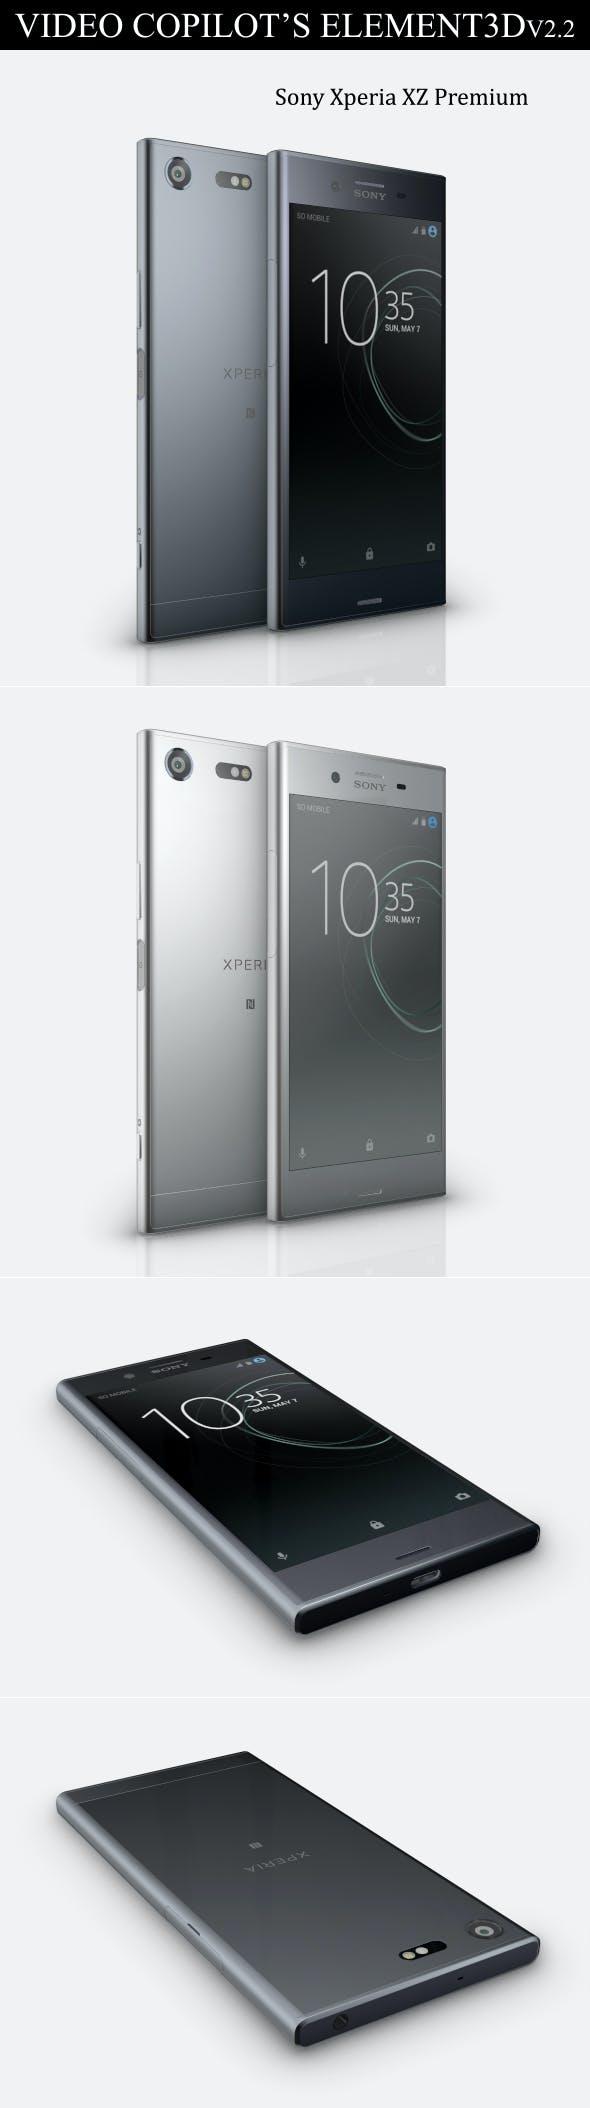 Element3D - Sony Xperia XZ Premium - 3DOcean Item for Sale